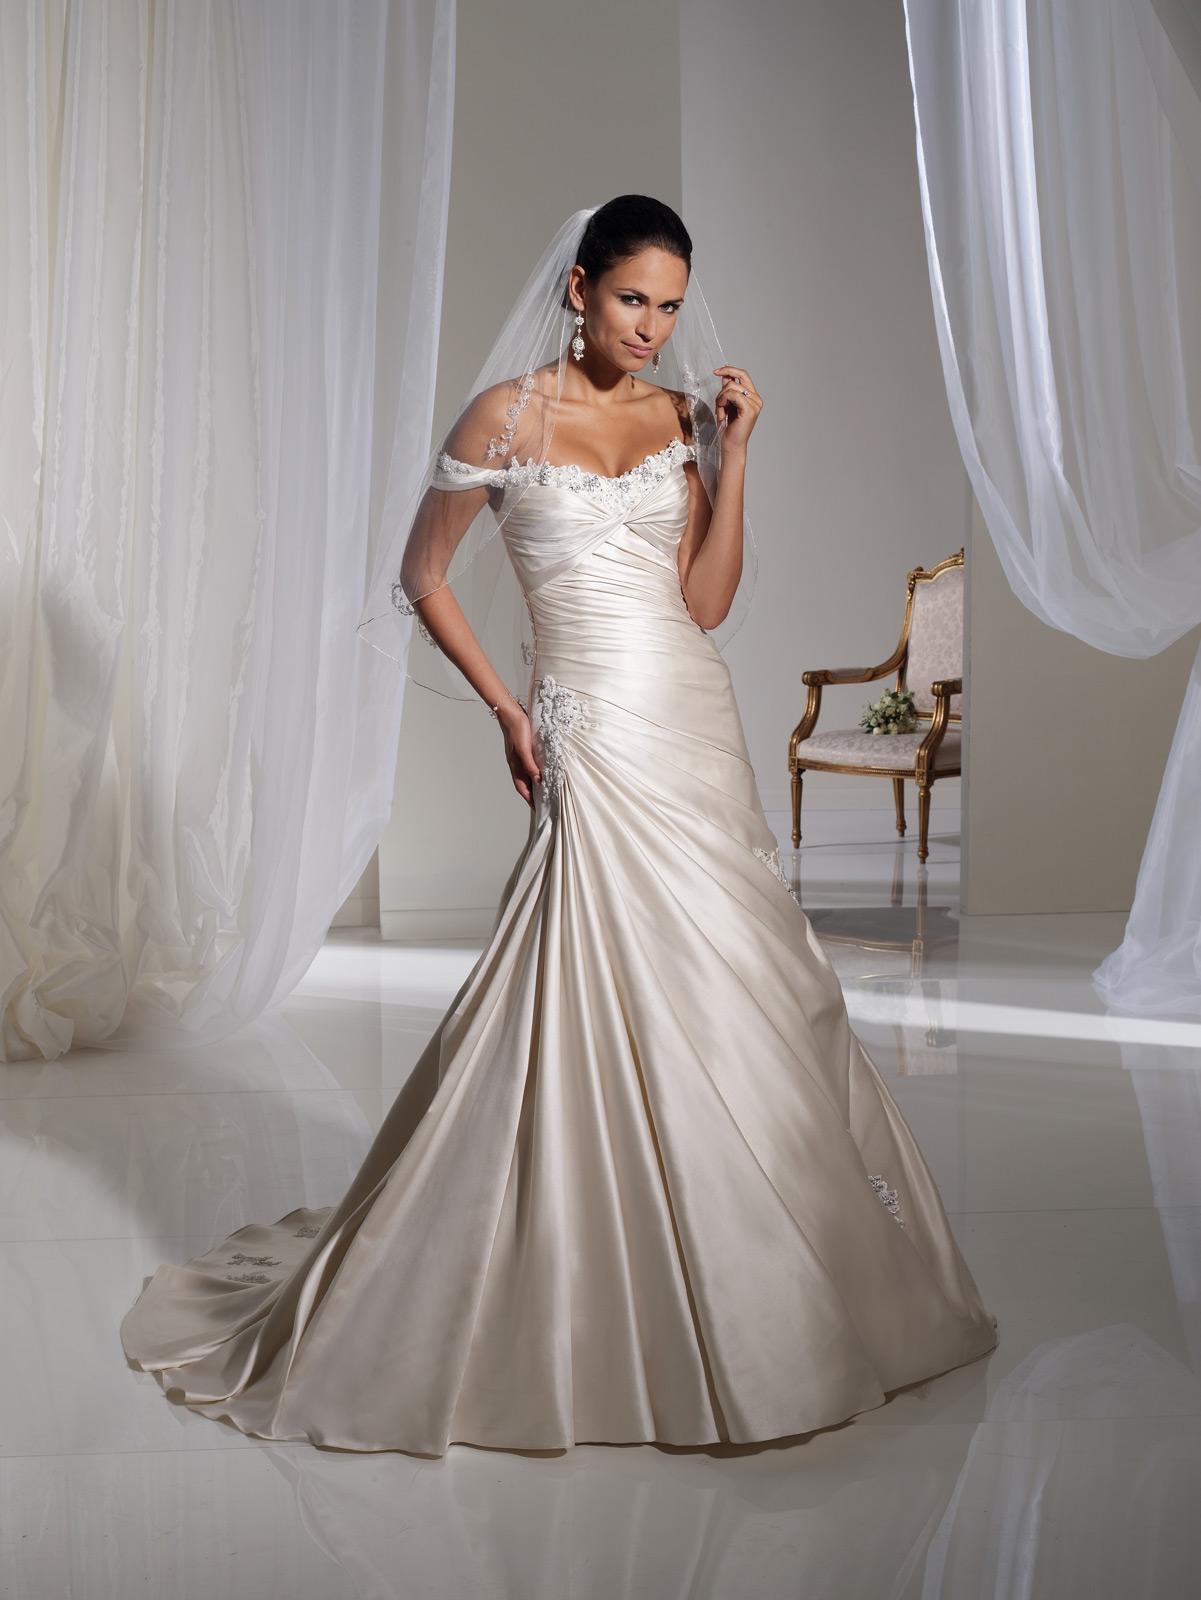 Alabaster Wedding Dress 4 Nice Available in Alabaster White